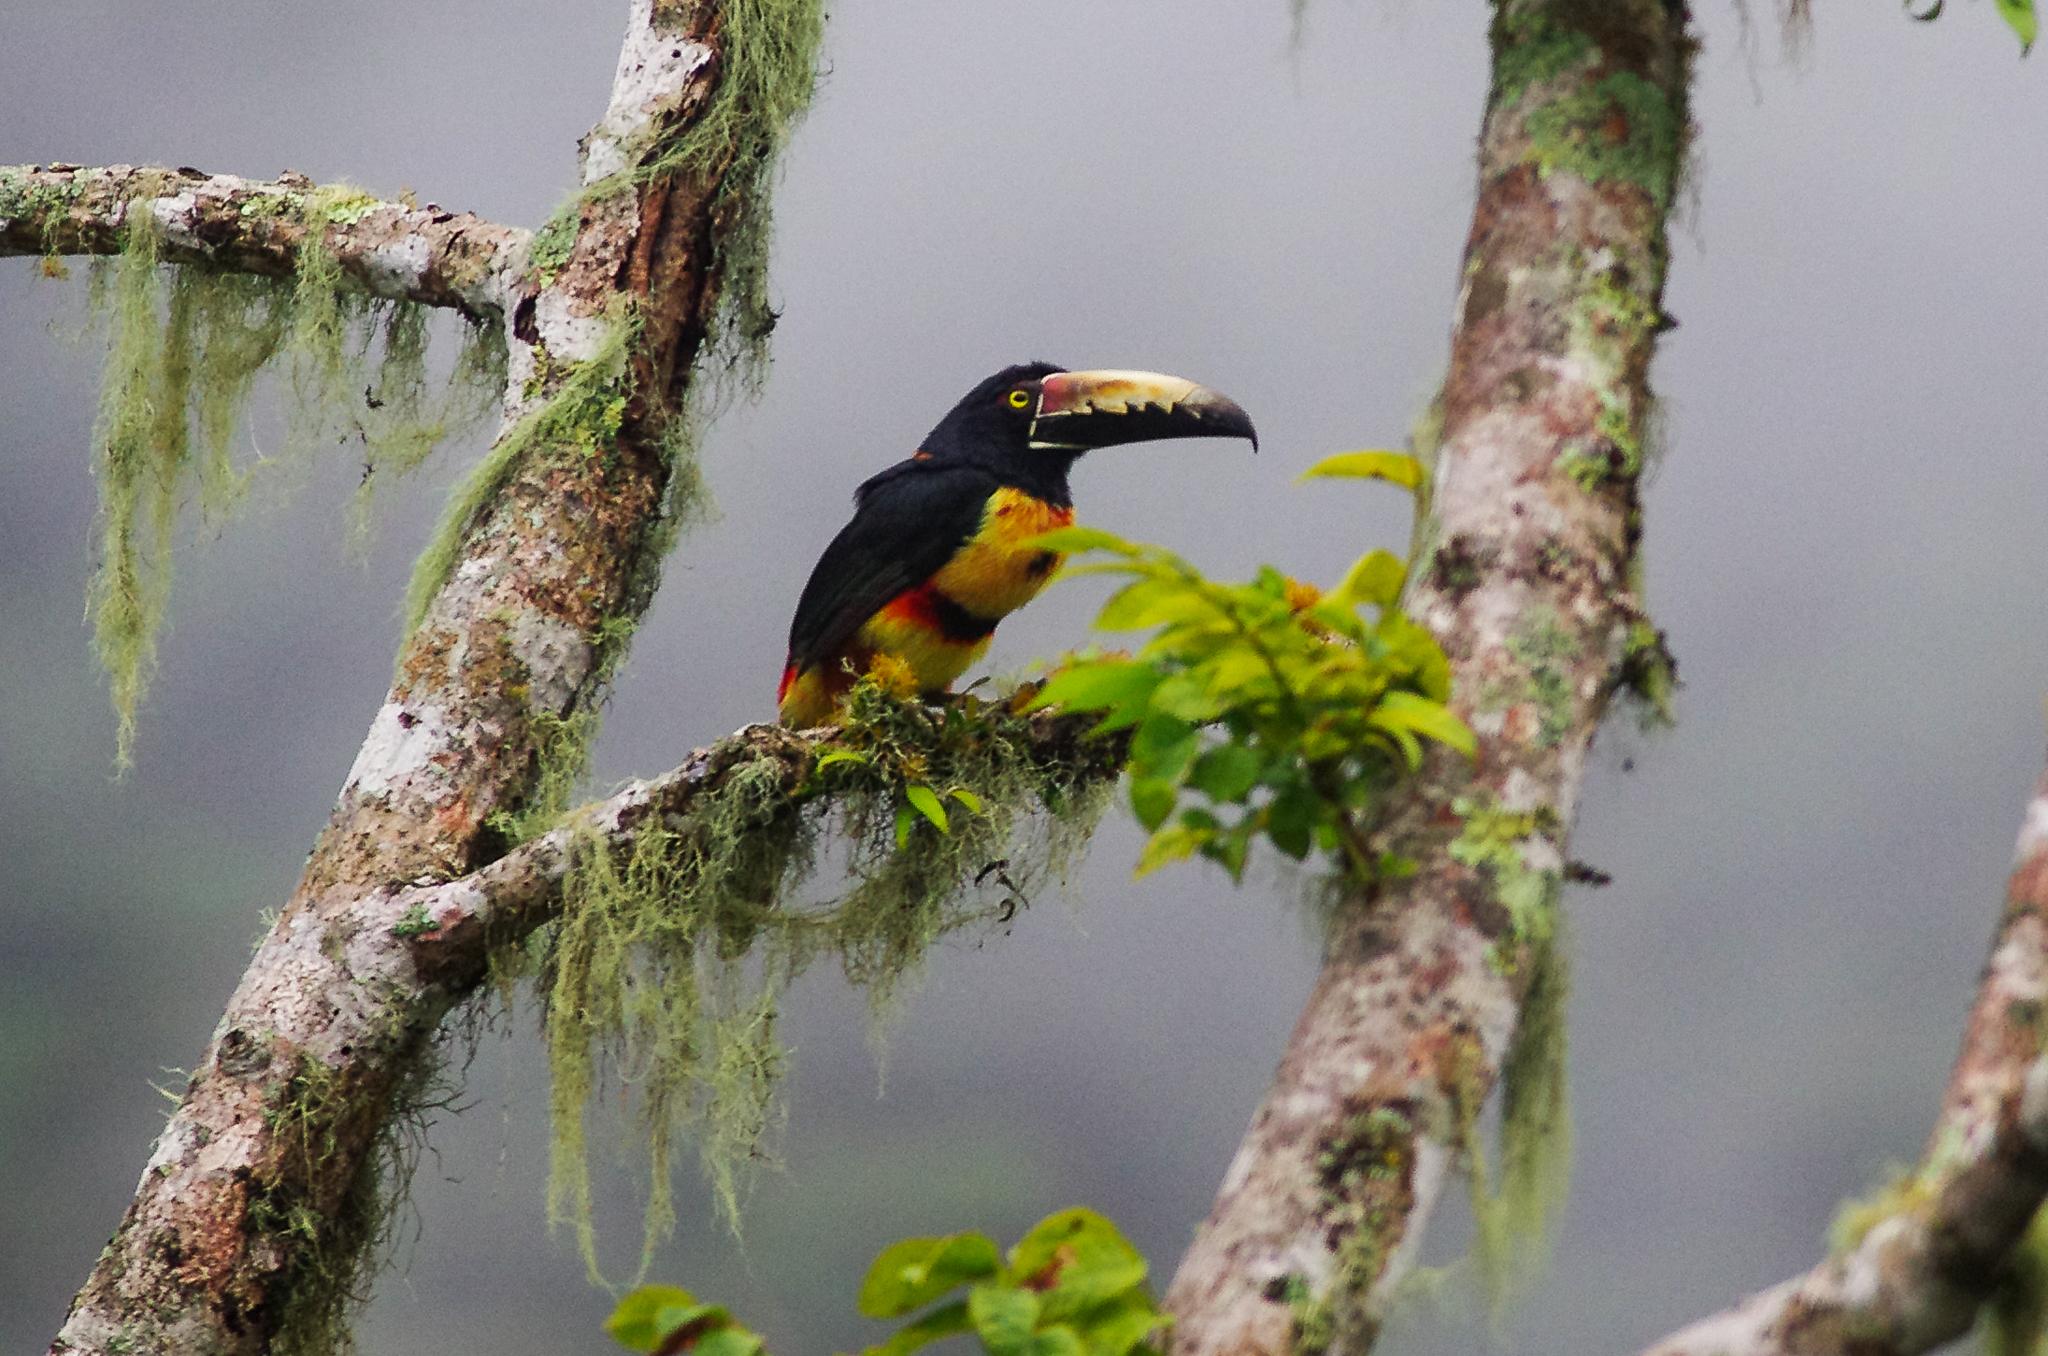 Arasari Acollarado - Collared Aracari